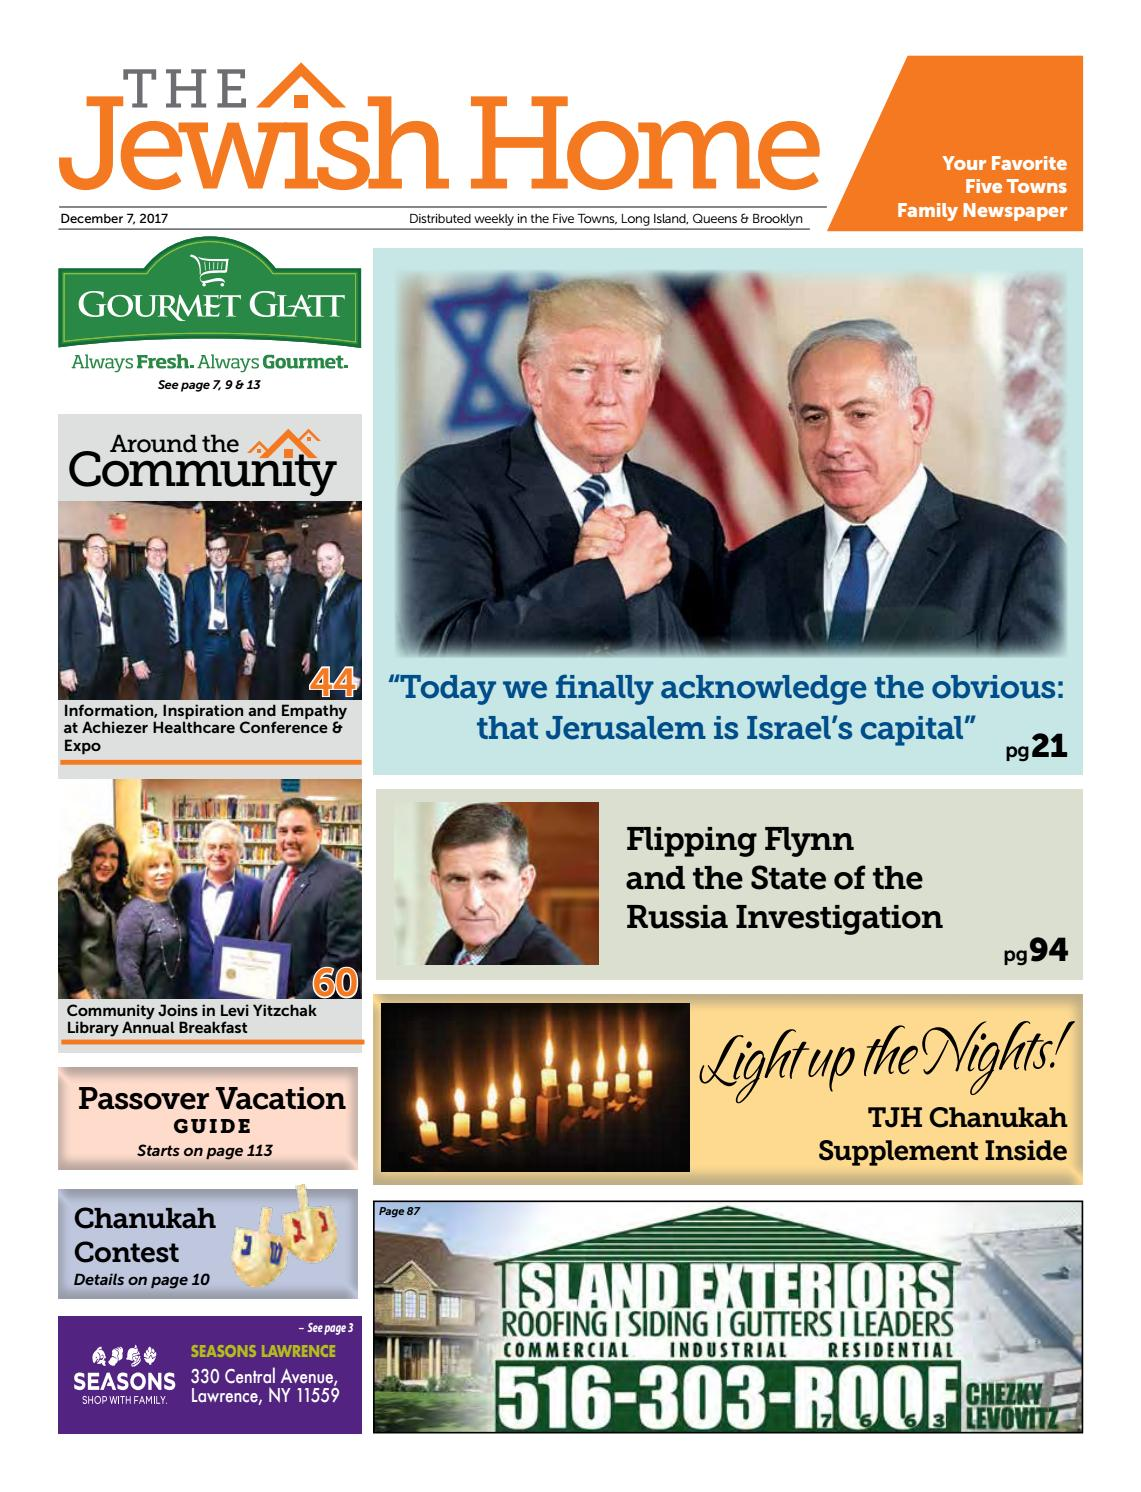 Five Towns Jewish Home - 12-7-17 by Yitzy Halpern - issuu